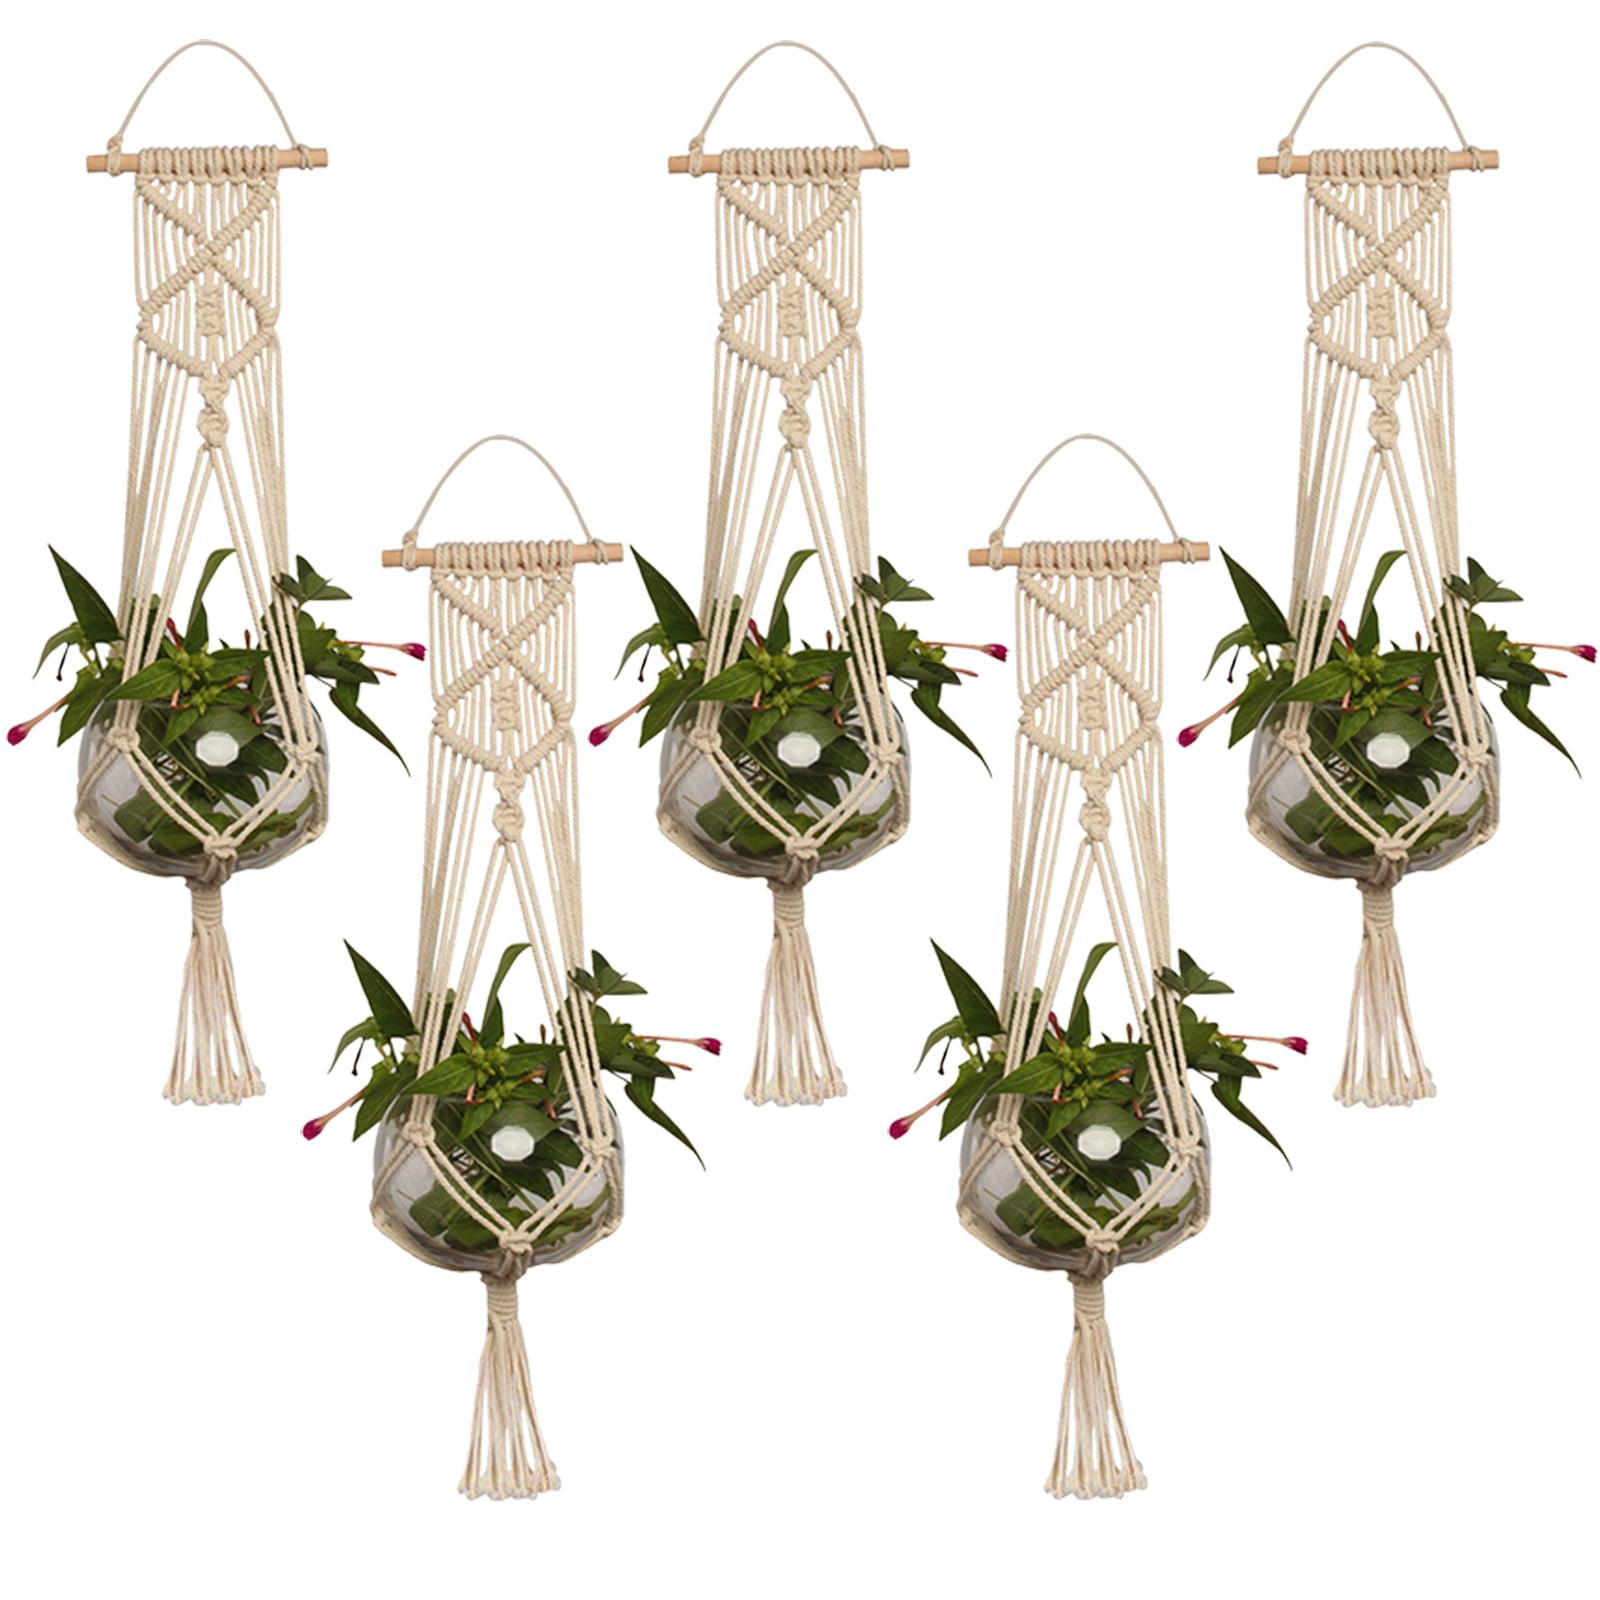 5-pack Macrame Plant Hanger Indoor Outdoor Hanging Planter Basket Jute Cotton Rope Braided Craft, 4 Legs 37 Inch